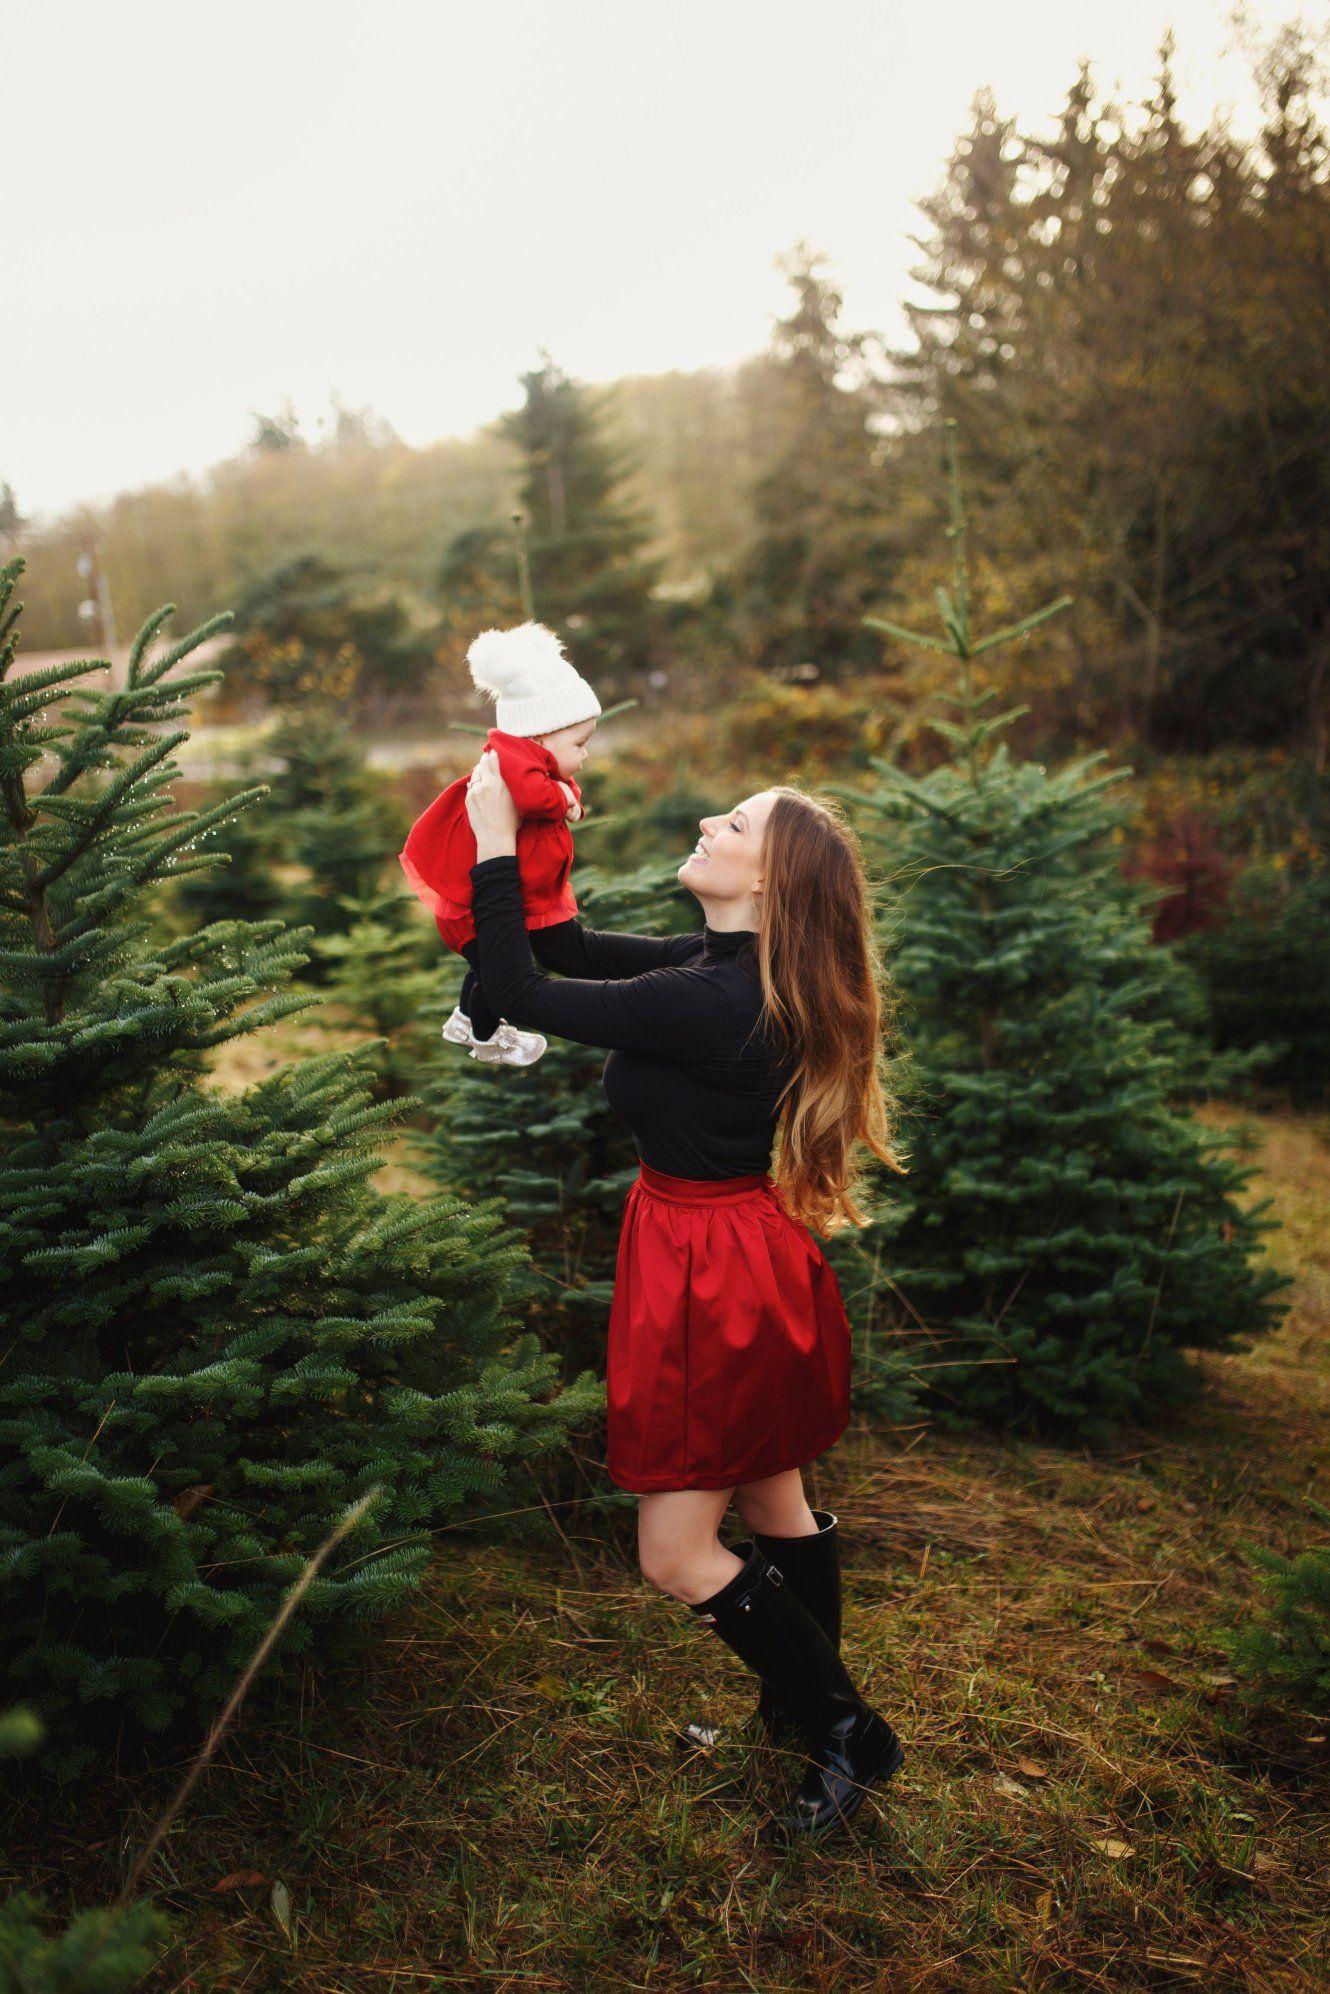 A Very Merry Christmas To You Bainbridge Boheme Christmas Pictures Outfits Christmas Family Photos Christmas Photoshoot